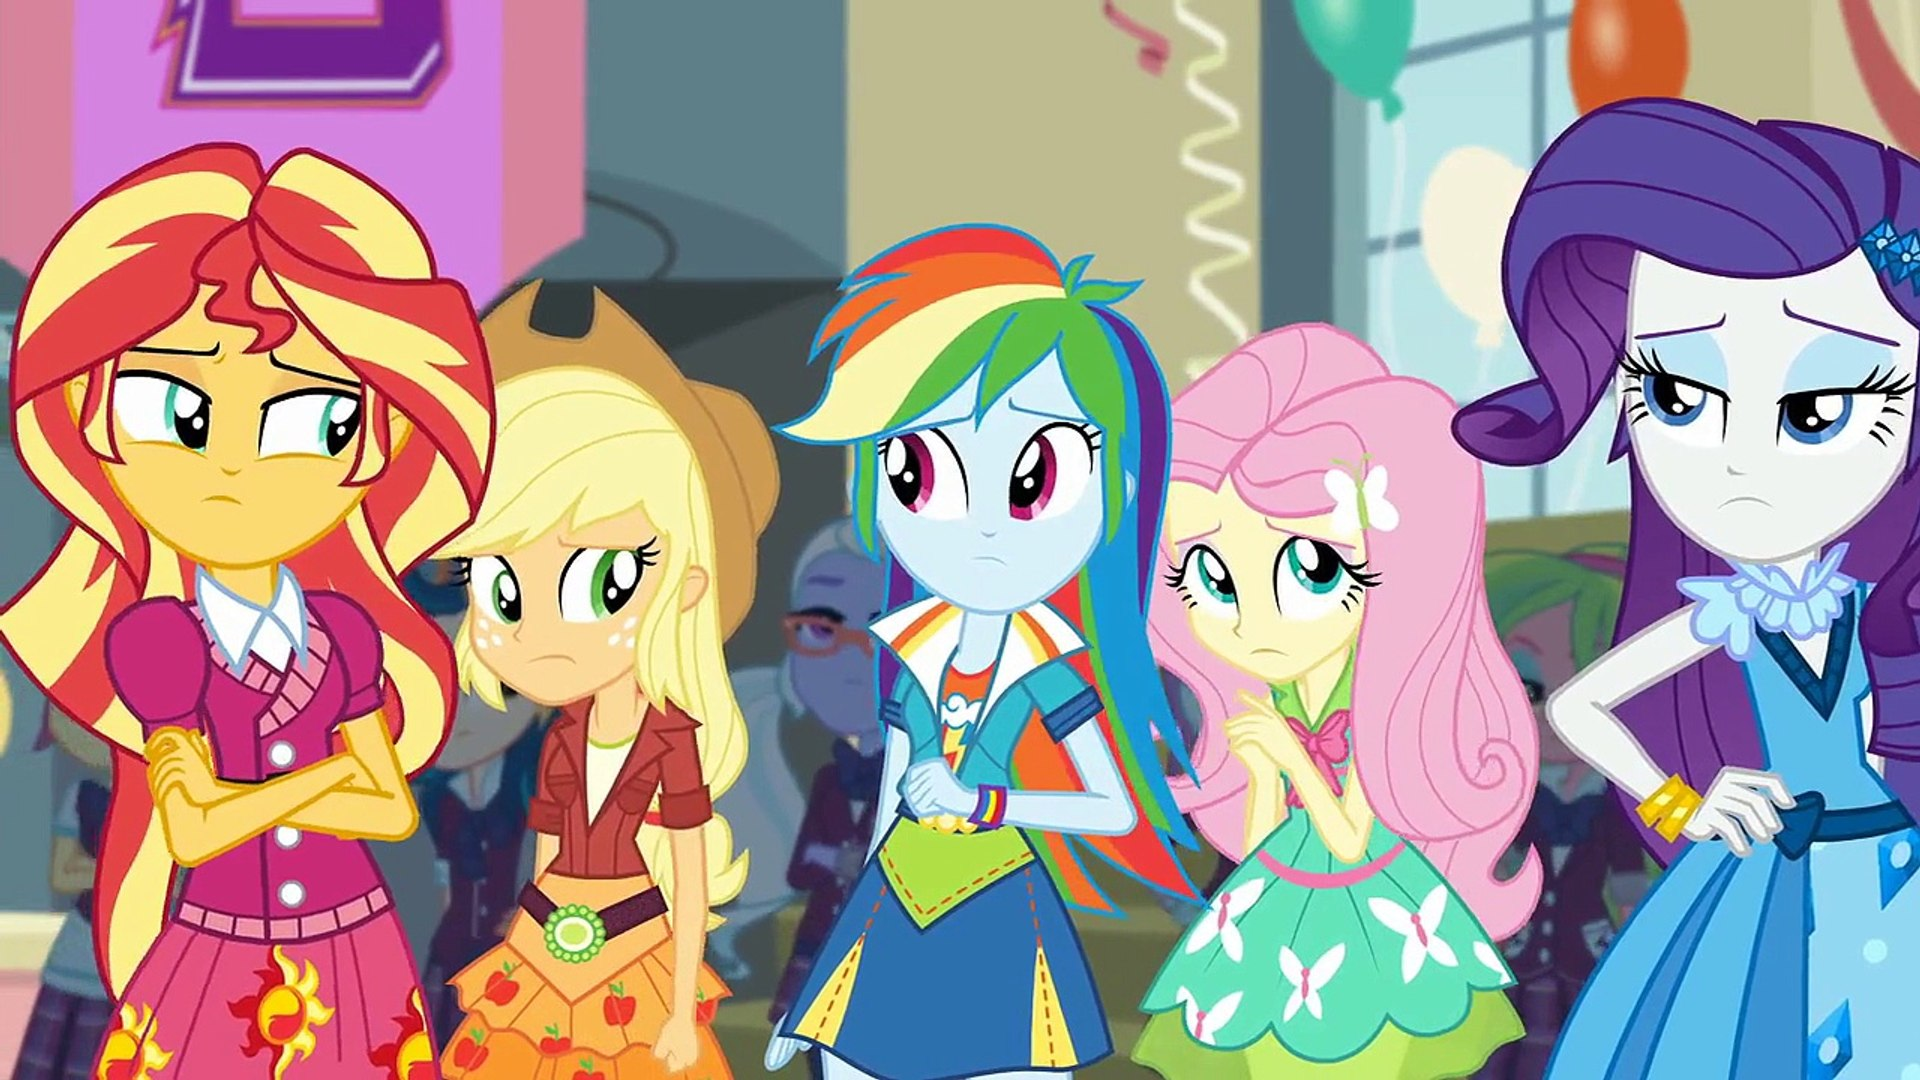 - My Little Pony Equestria Girls: Friendship Games (Japanese, Part 2